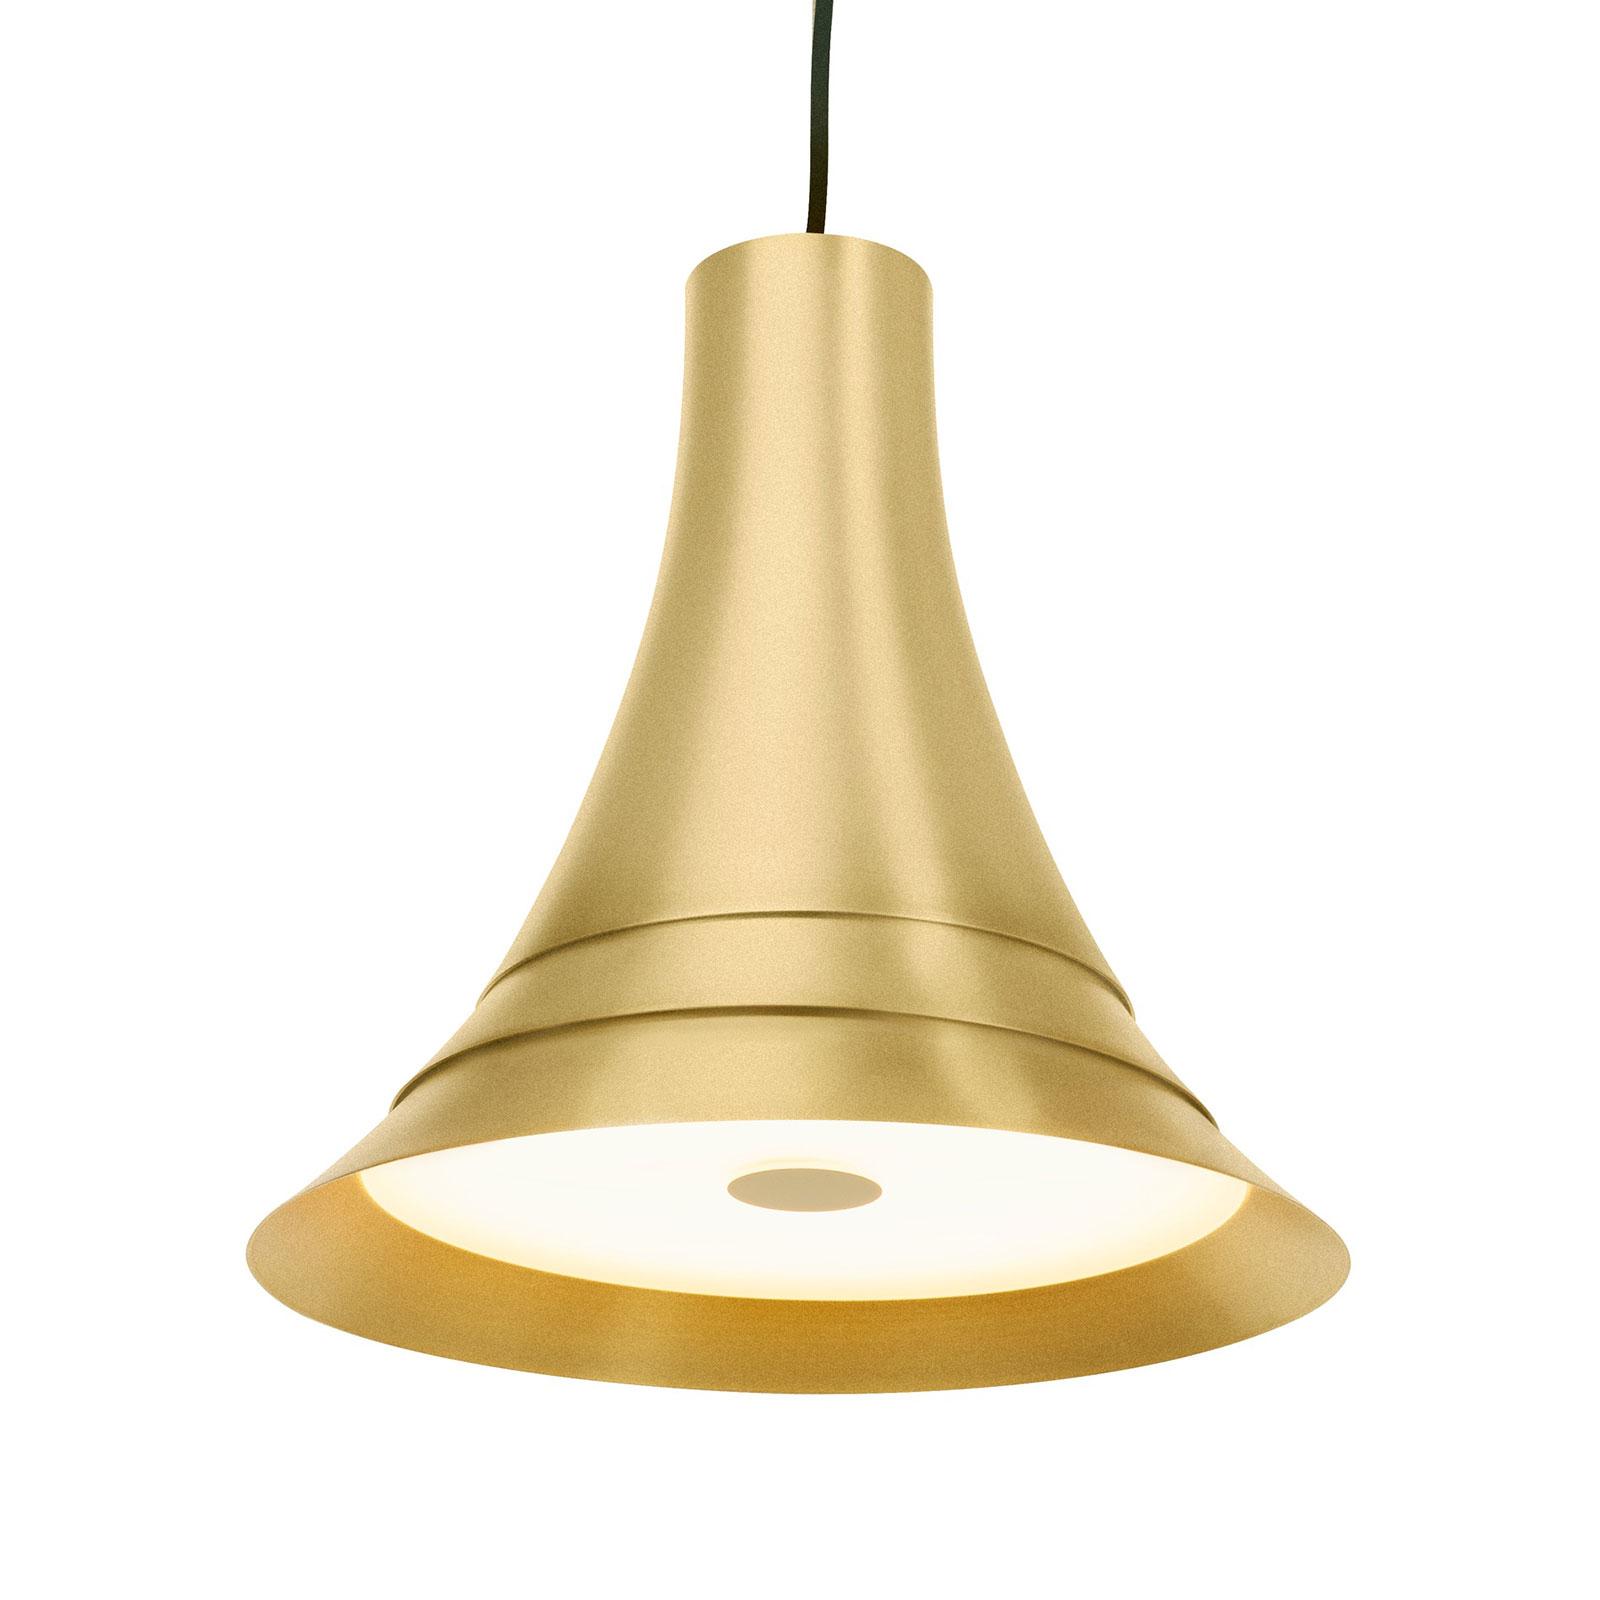 SLV Bato 35 lampa wisząca LED mosiądz Ø35cm